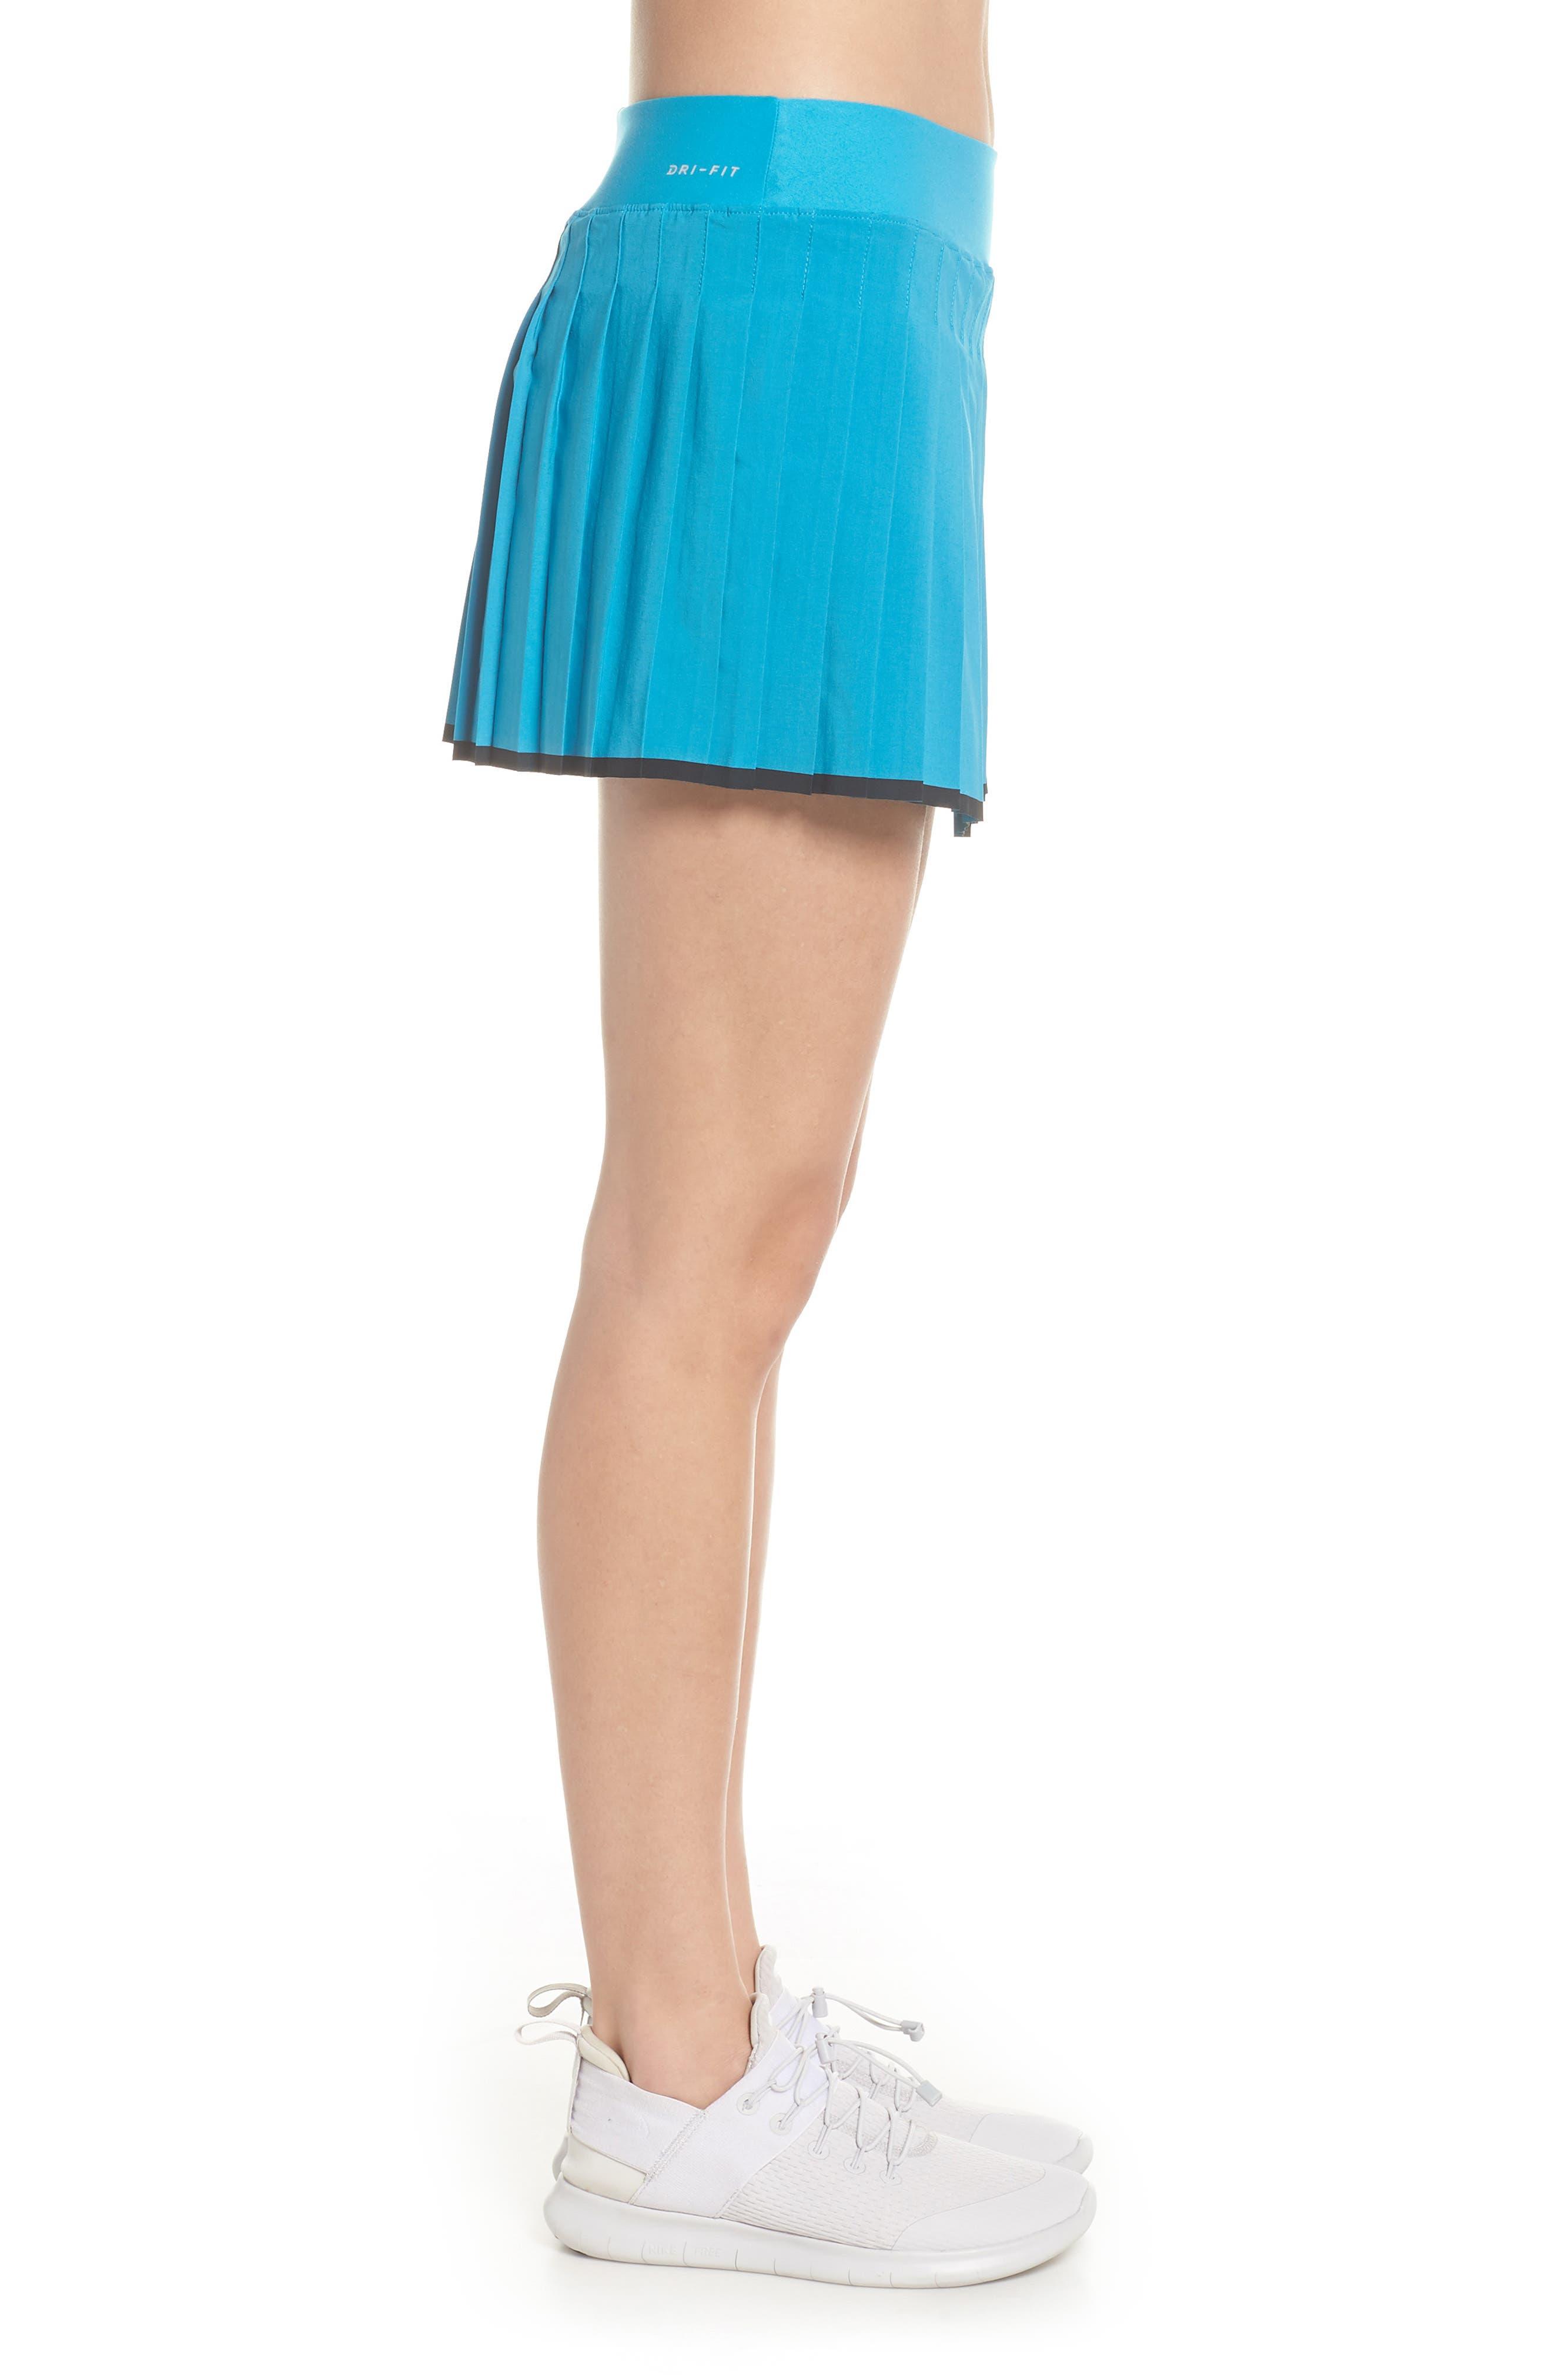 'Victory' Pleat Dri-FIT Tennis Skirt,                             Alternate thumbnail 3, color,                             Neo Turquoise/ Black